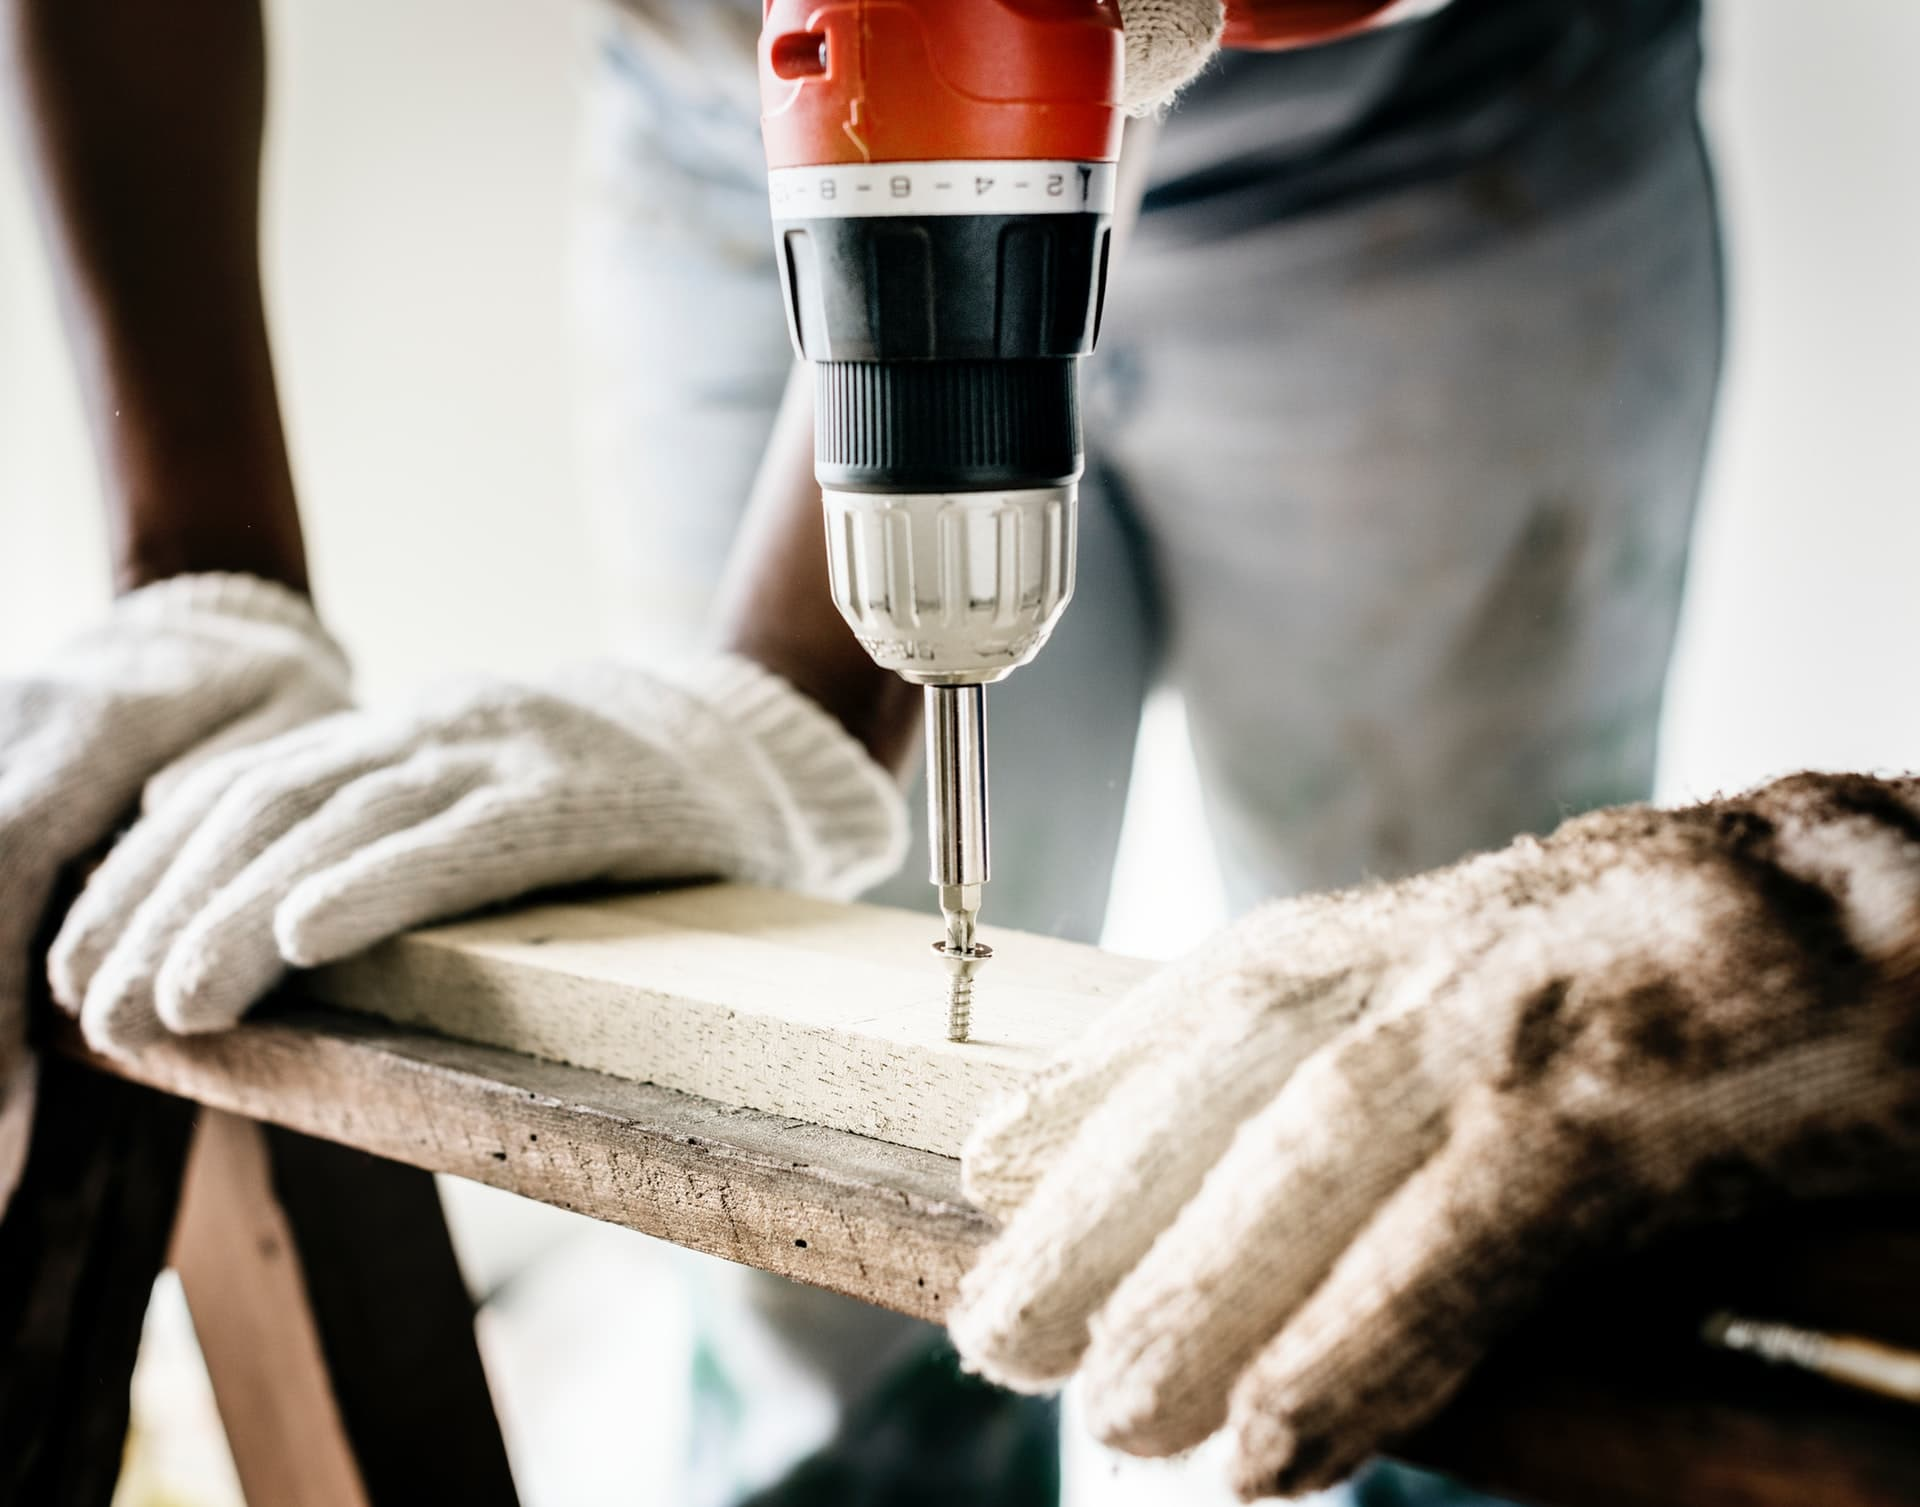 builder-carpenter-close-up-1251176.jpg?fit=1920%2C1507&ssl=1